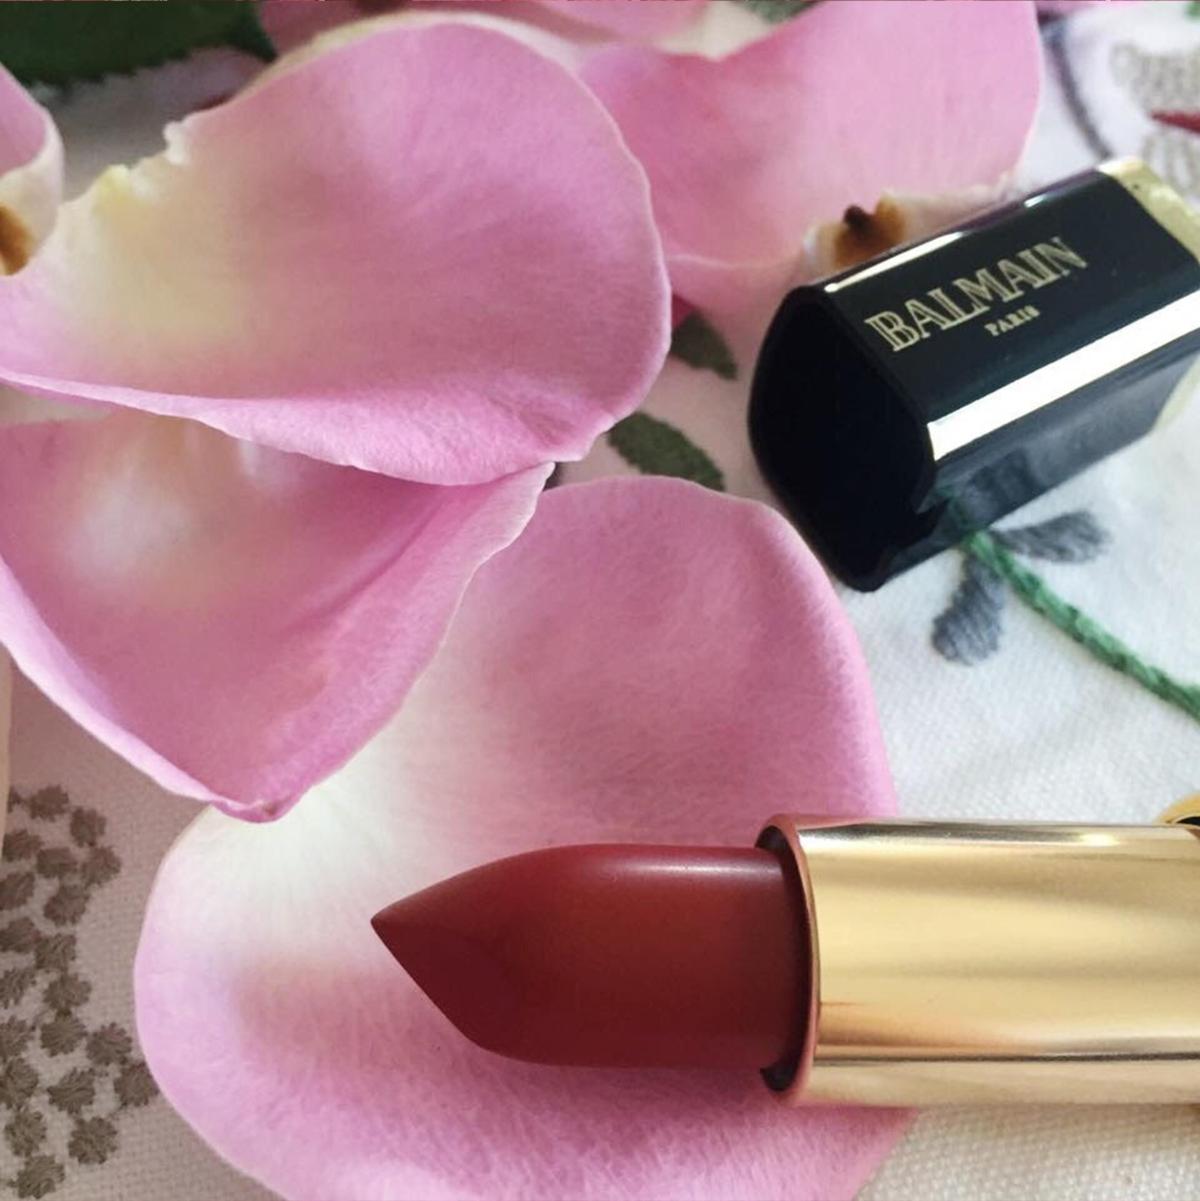 Recenzija: L'Oréal Paris X Balmain Color Riche ruž zausne